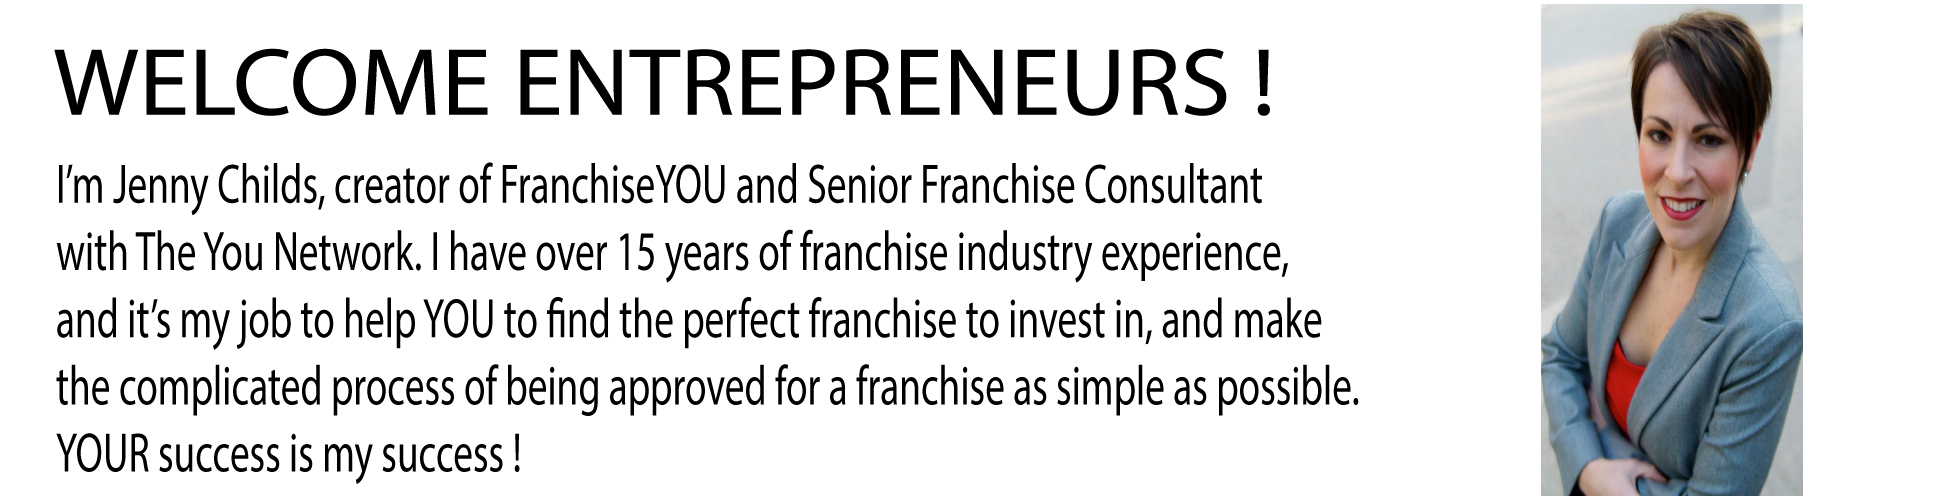 franchise-consultant,franchise-guide,franchise-help,how-to-start-franchise,guide-to-franchise-business